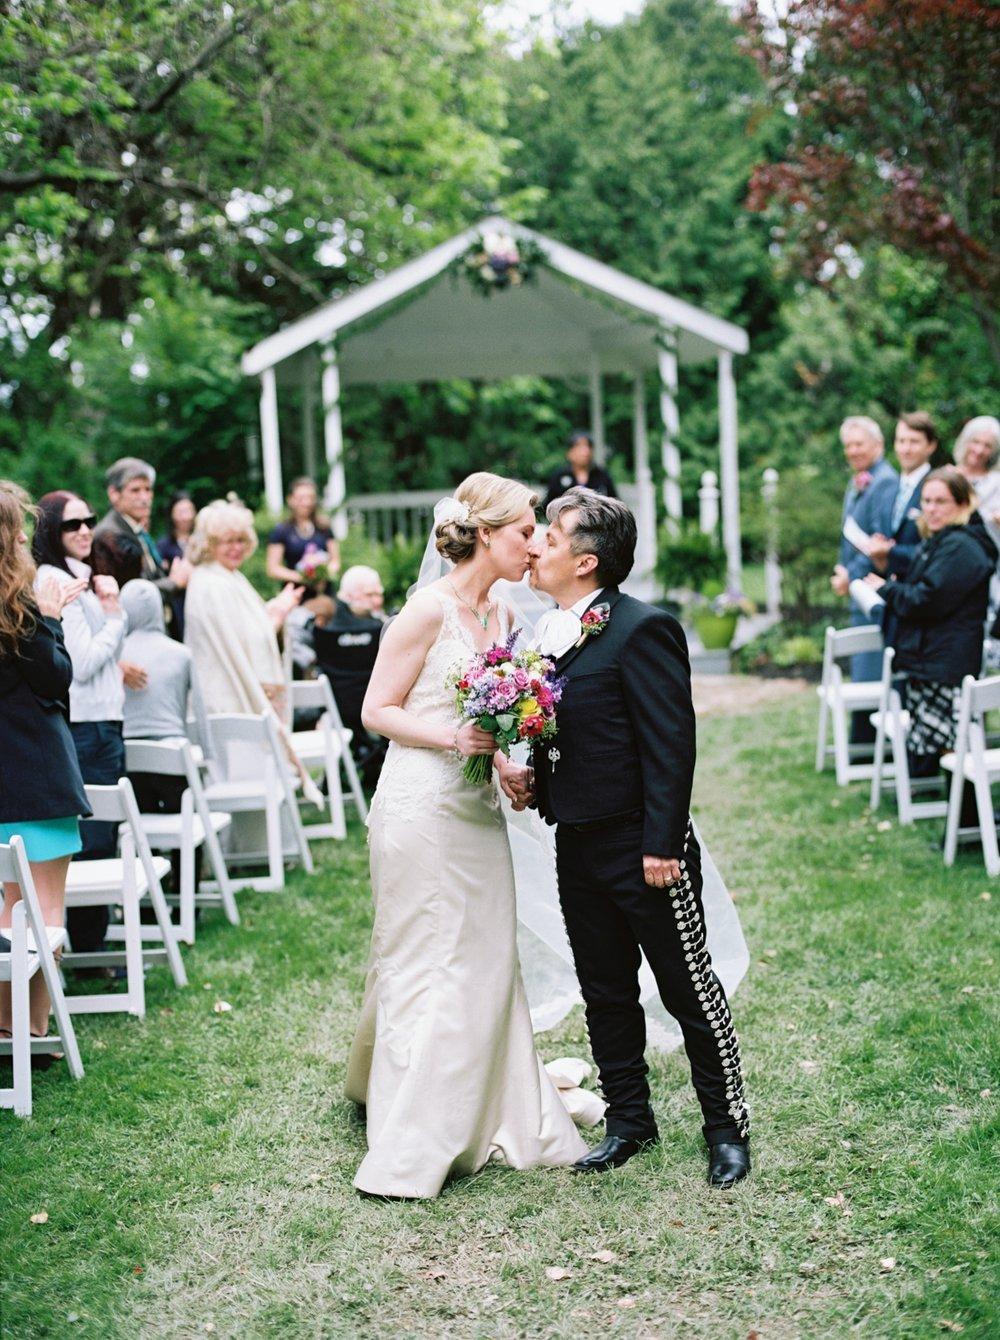 season magnolia manor wedding elisa ignacio czar goss photo 18.jpg